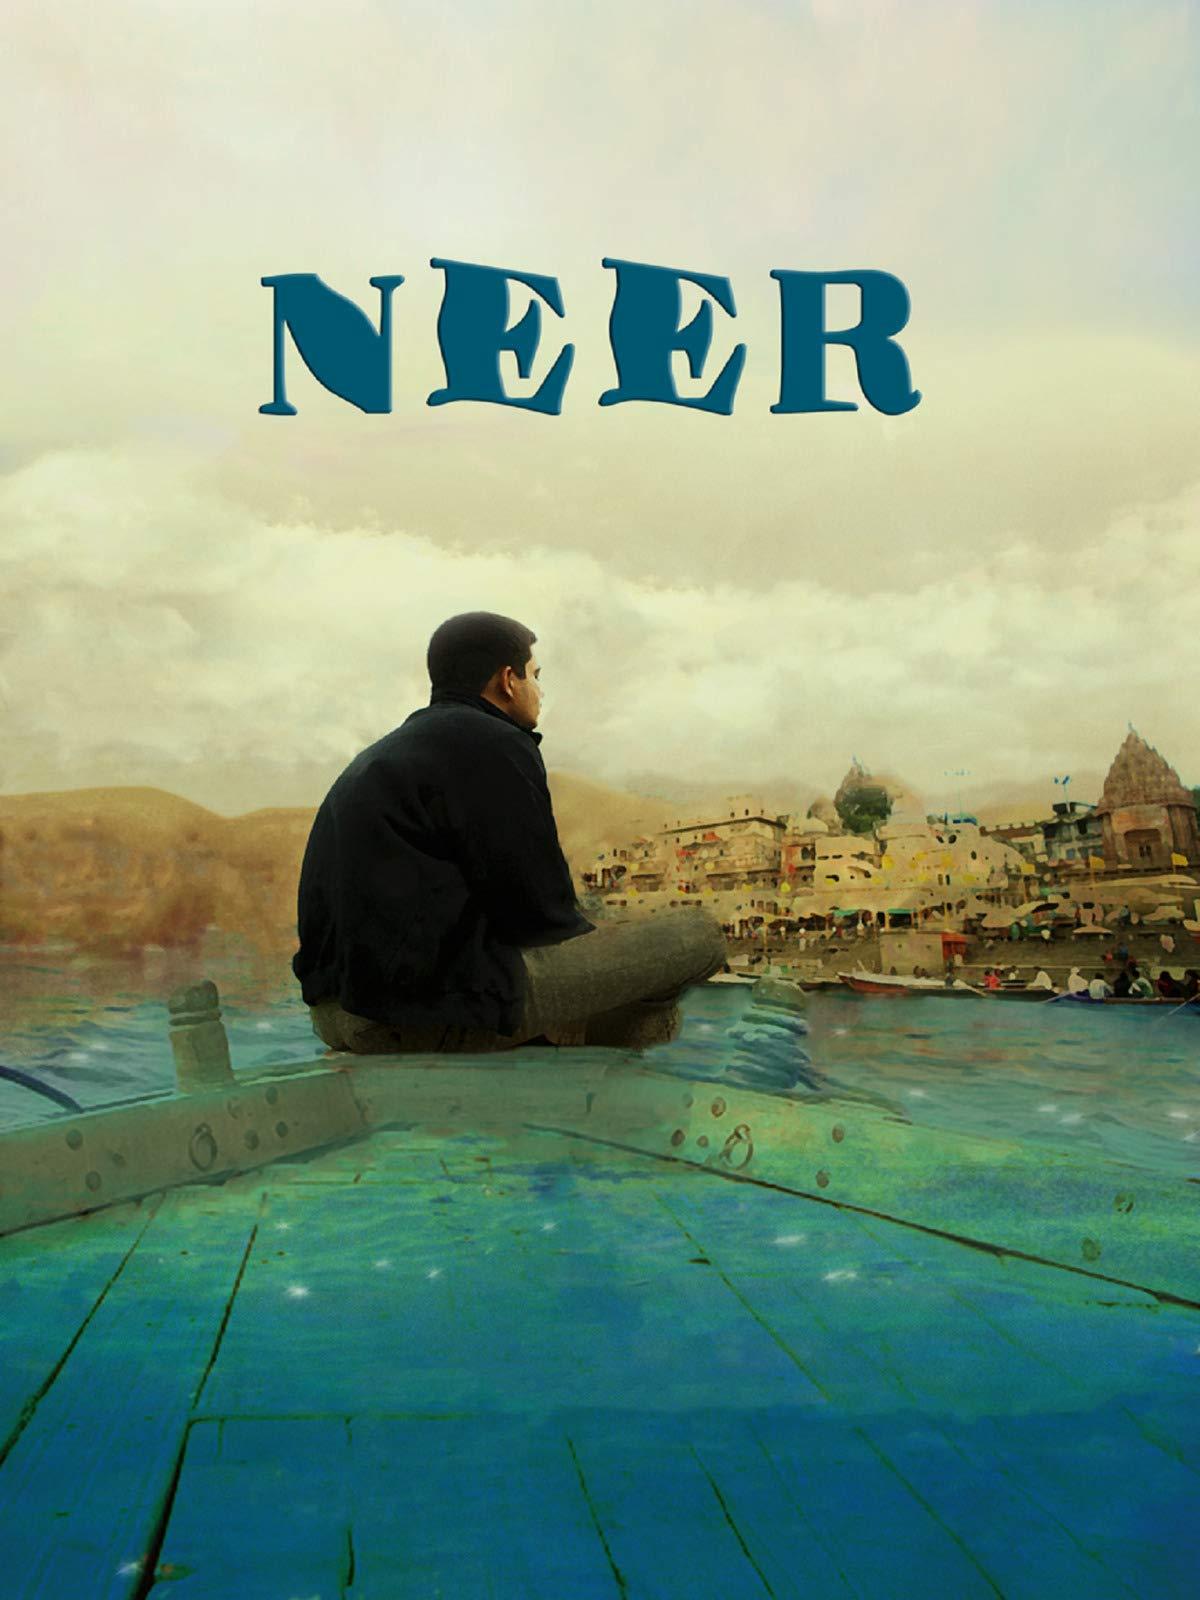 Neer (Water)